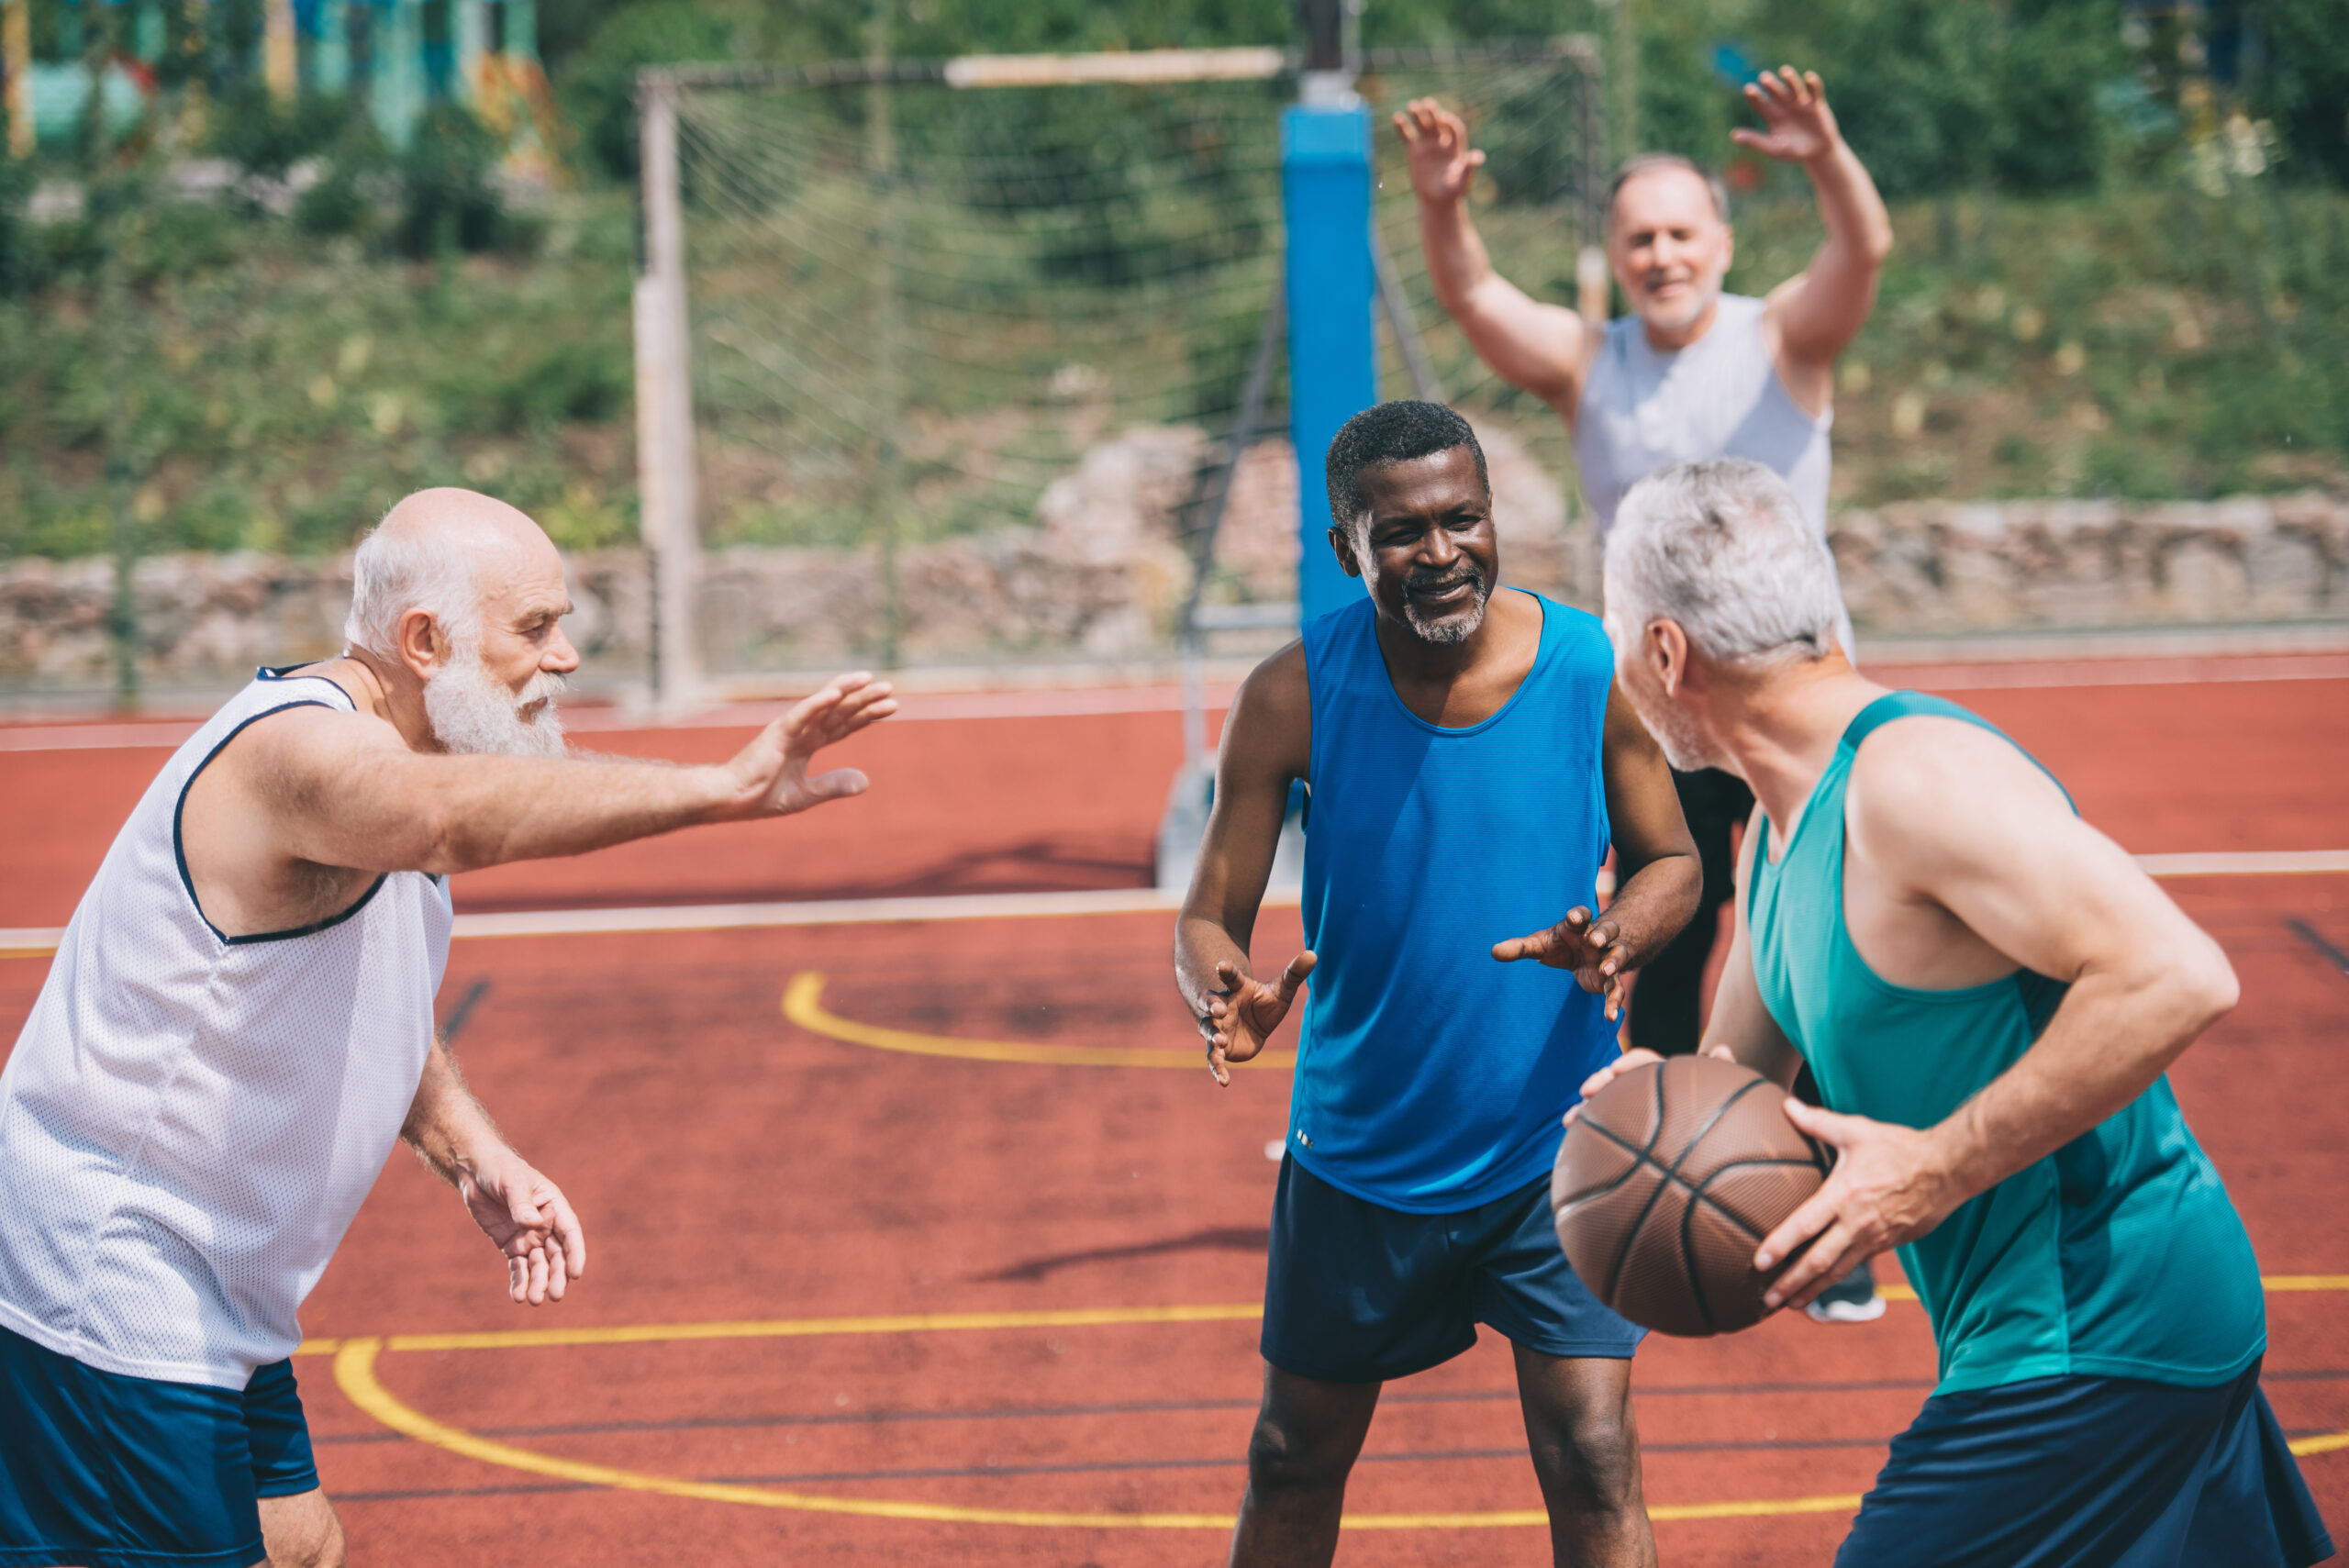 adults playing sports